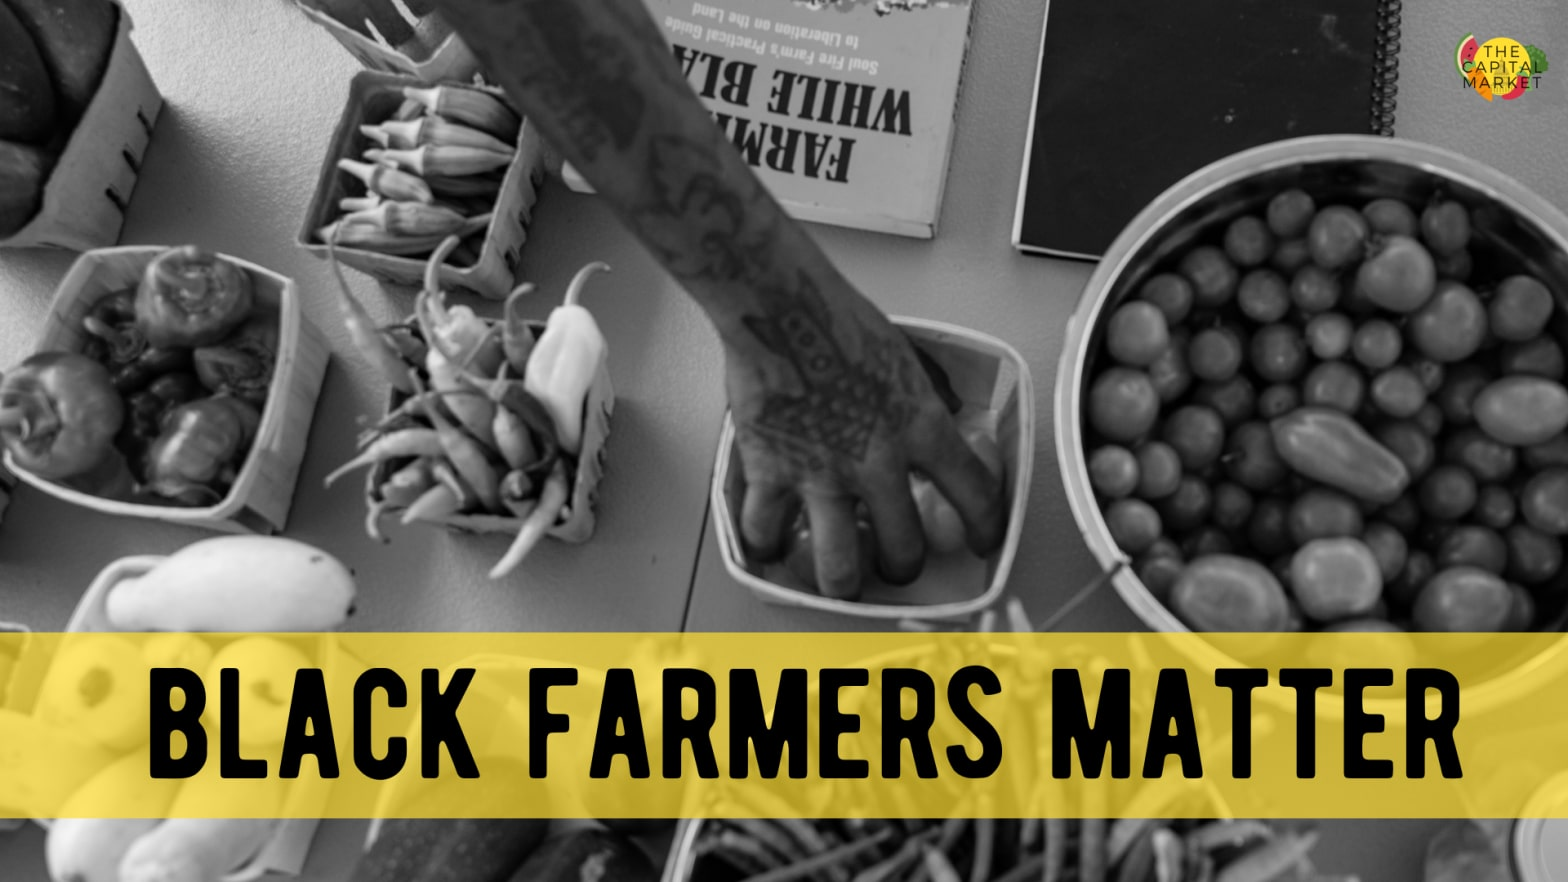 Black Farmers Matter